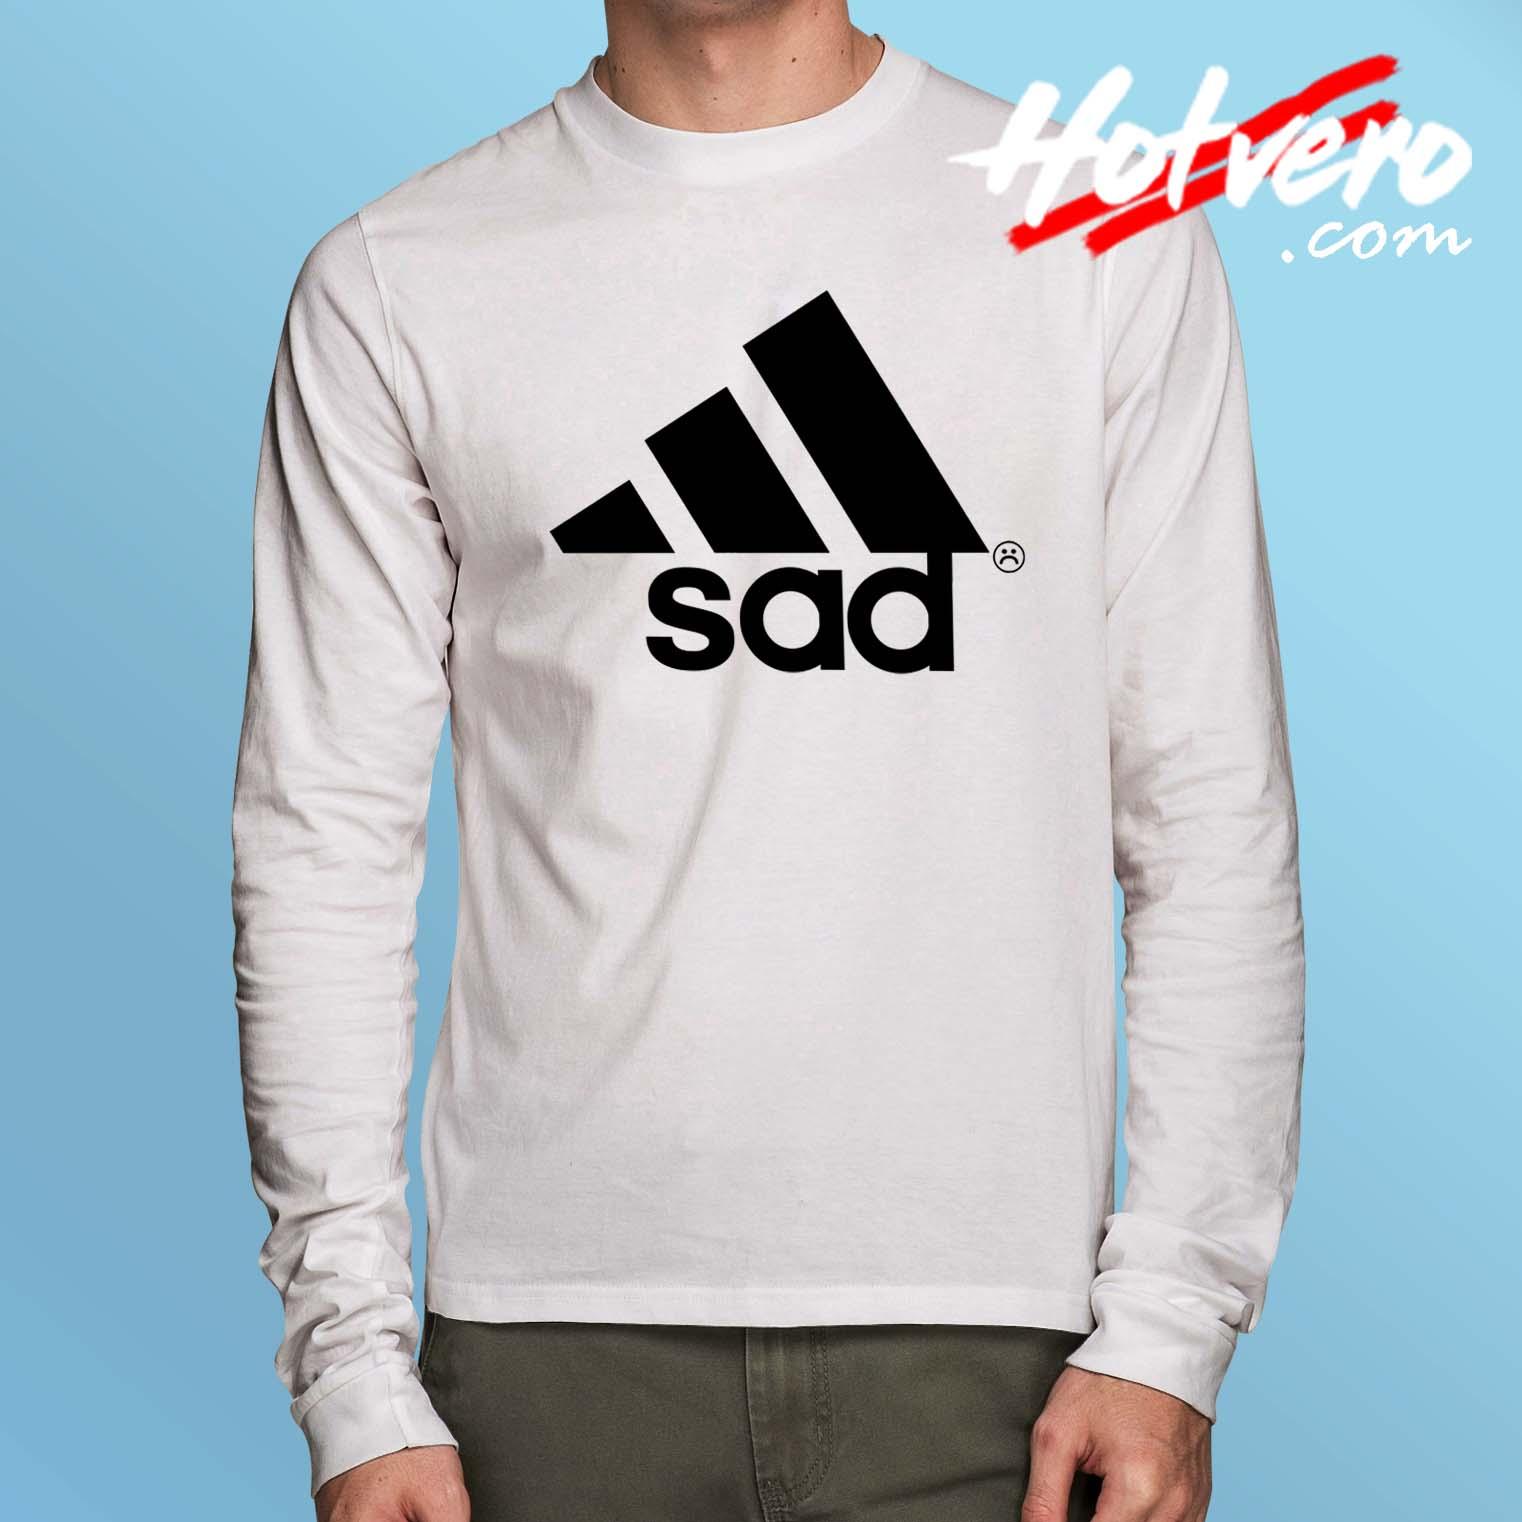 11250cdb4 Funny Sad Adidas Parody Long Sleeve Shirt - Hotvero.com